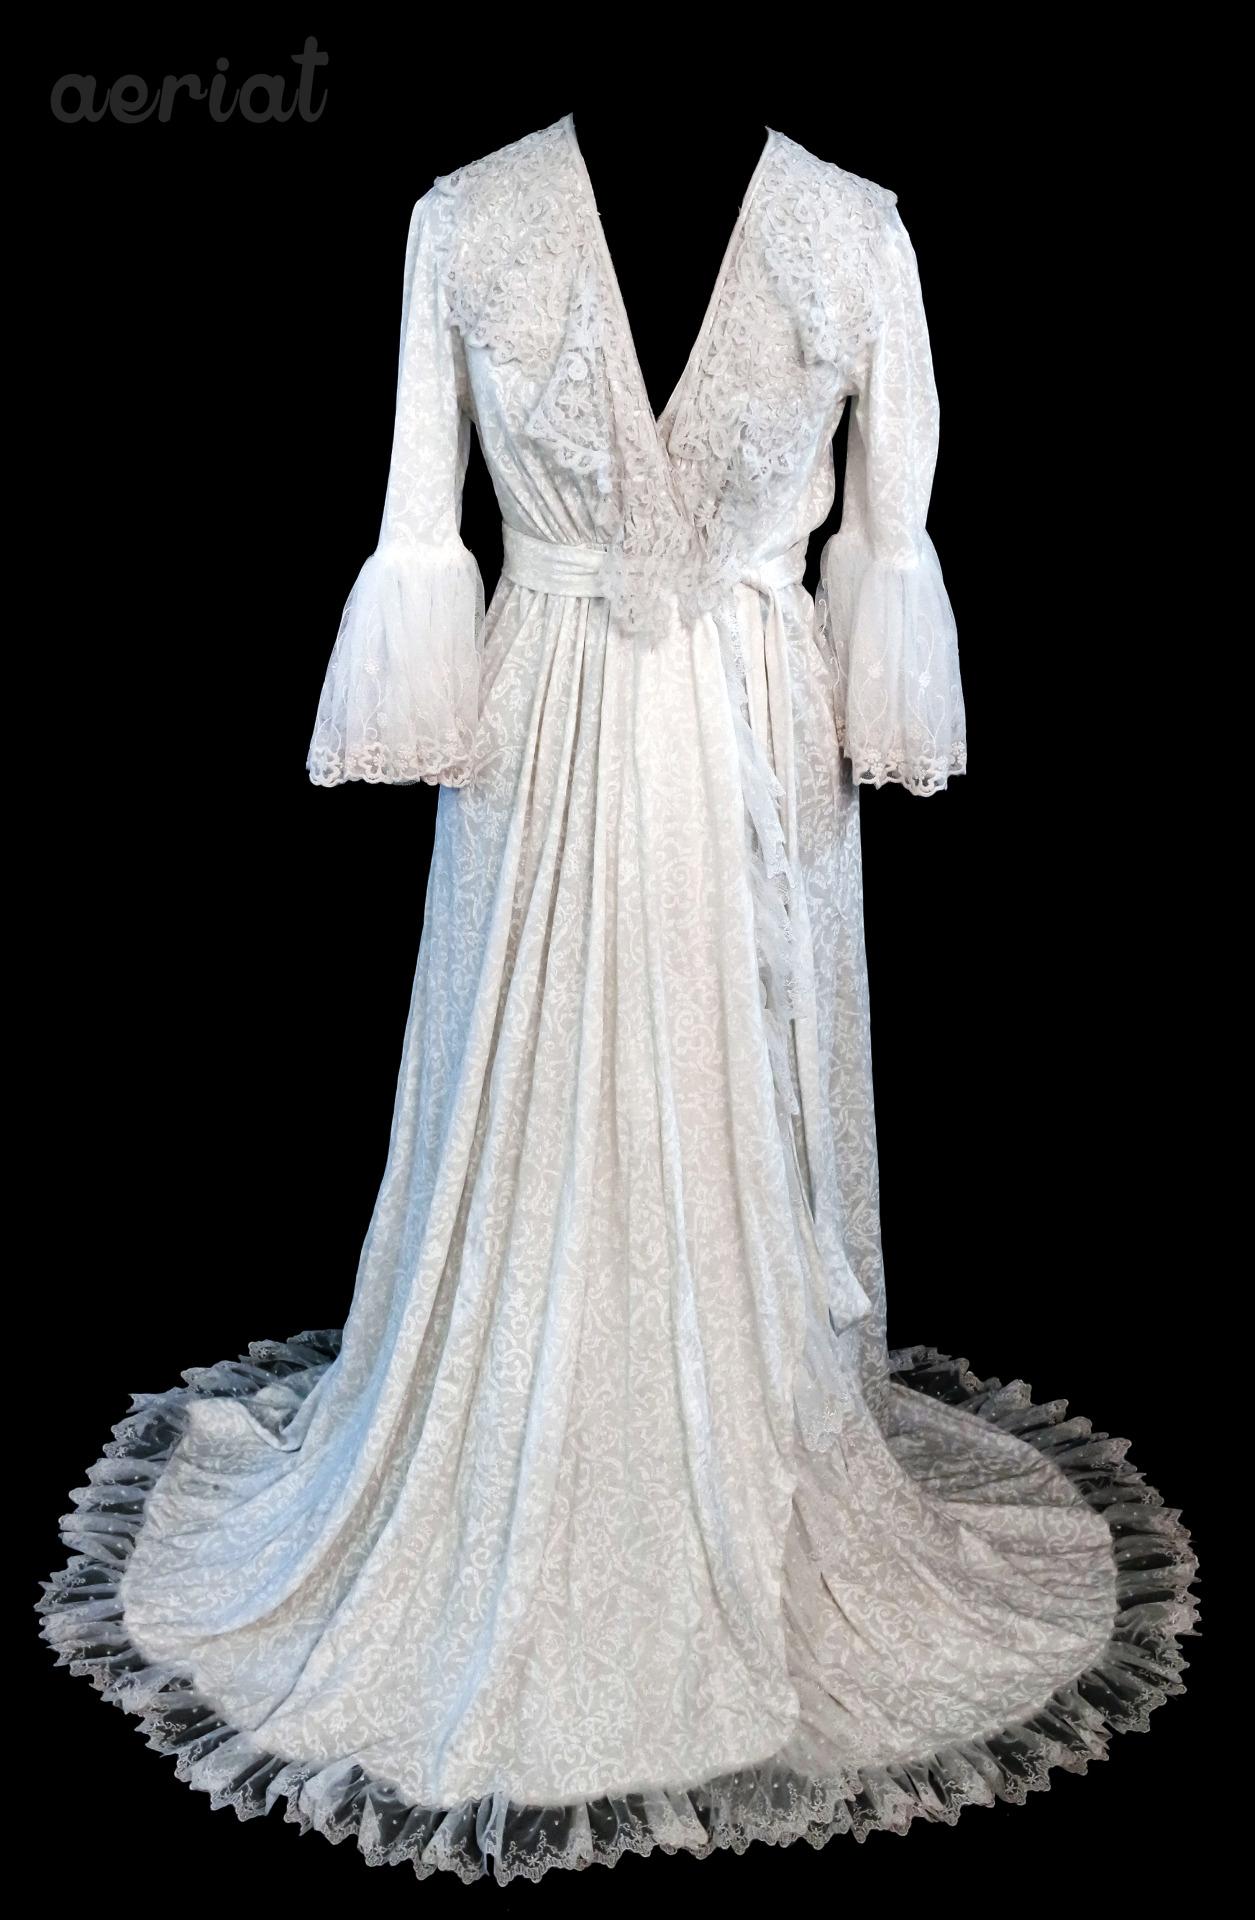 Aeriat Christine Daae Inspired Bridal Robe